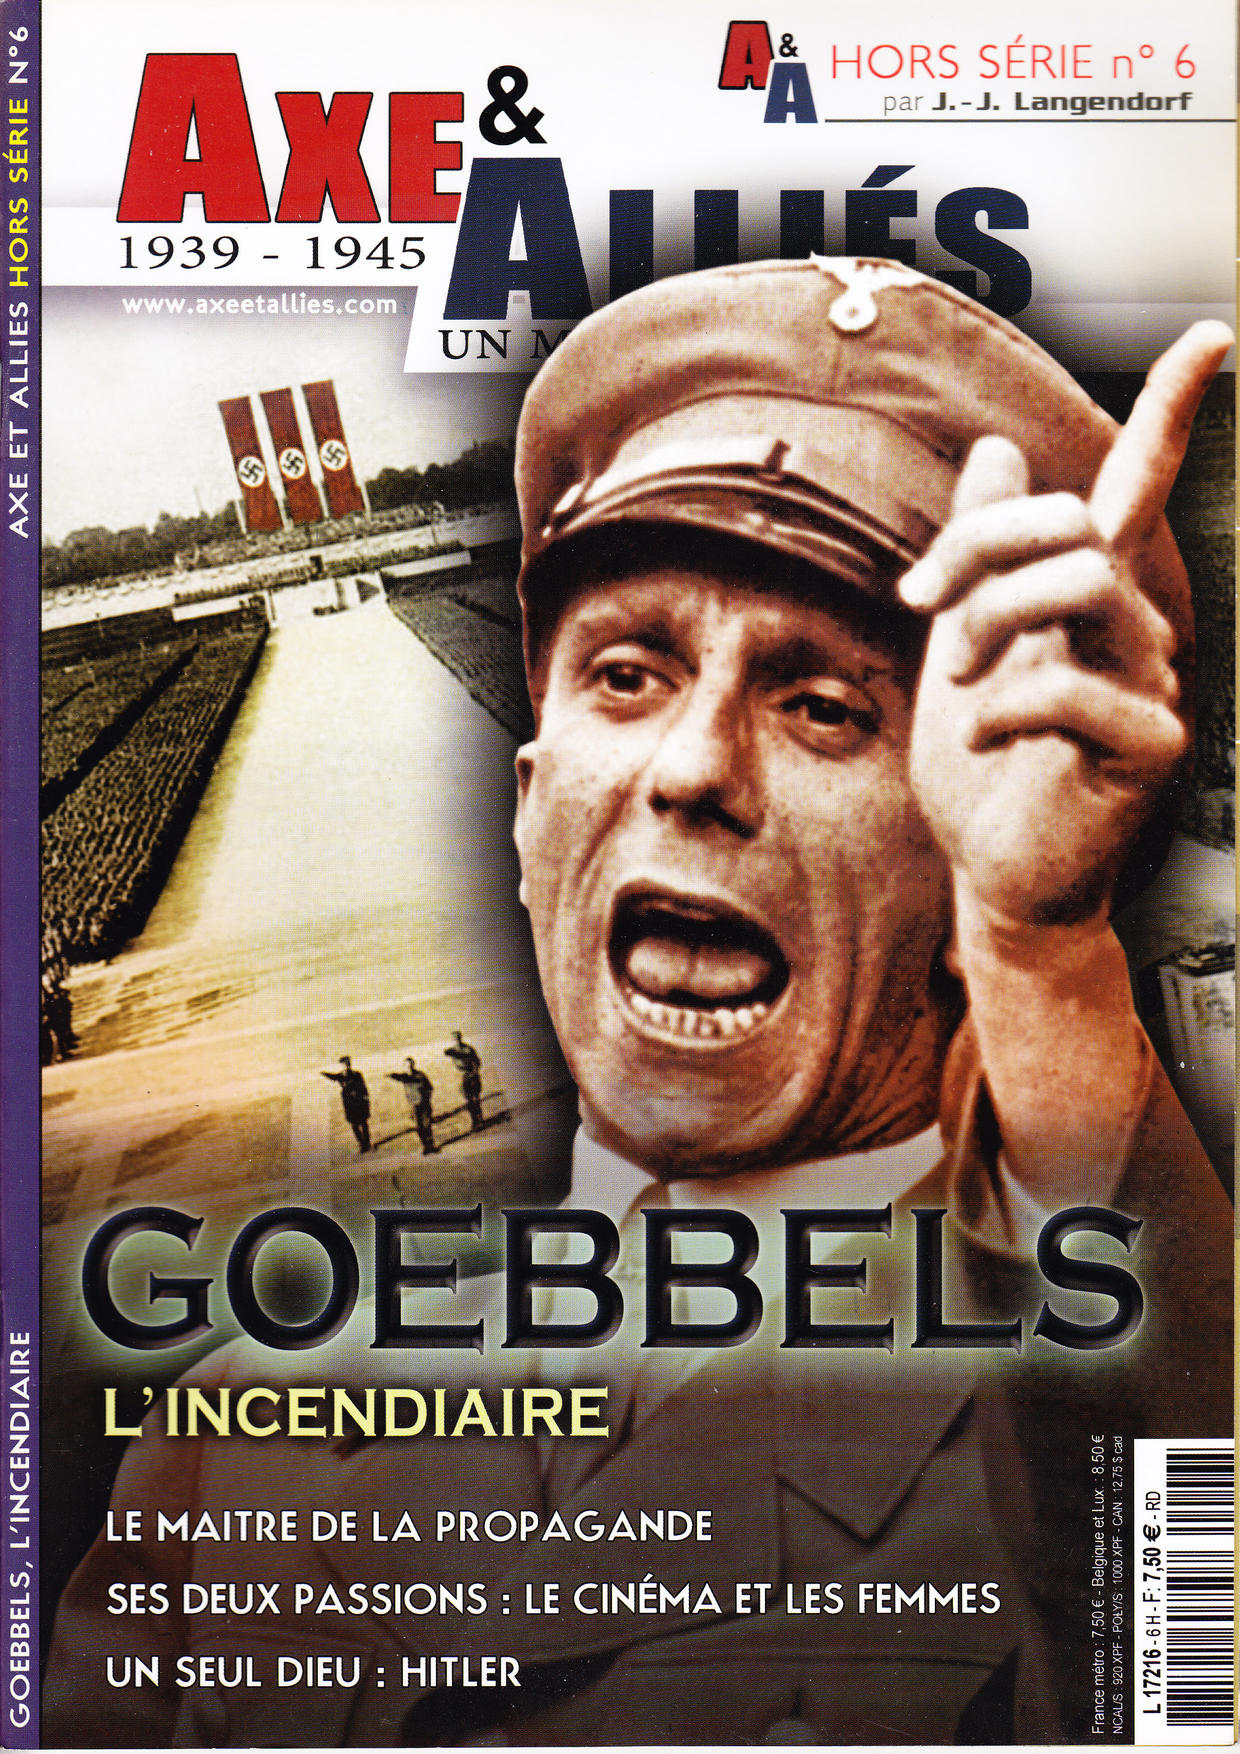 Axe & Alliés - 1939 - 1945 - Hors série 06